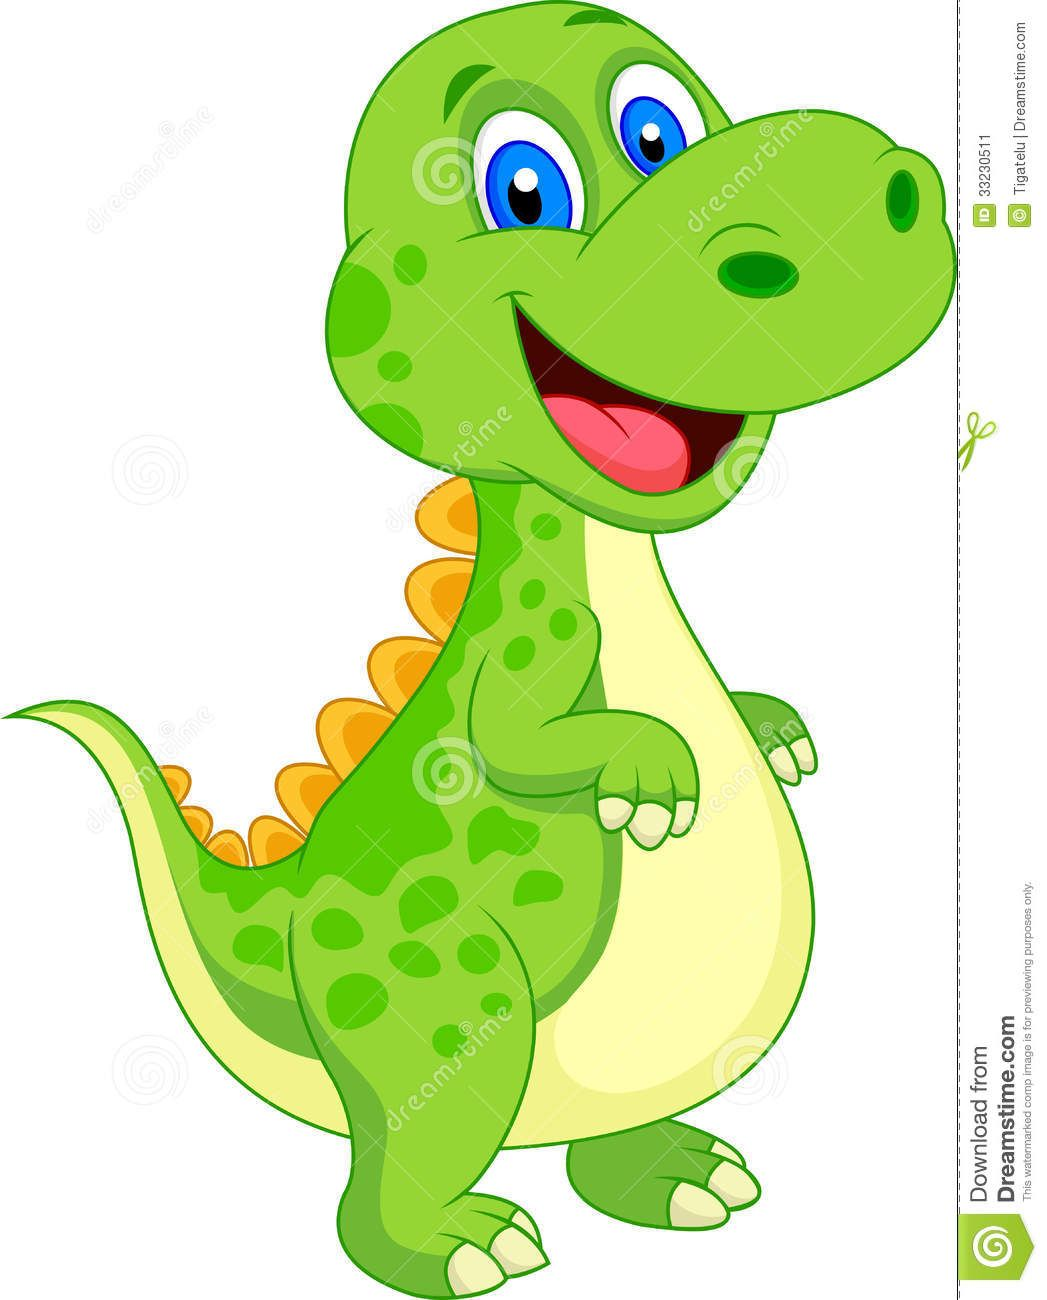 small resolution of cute dinosaur cartoon stock image image 33230511